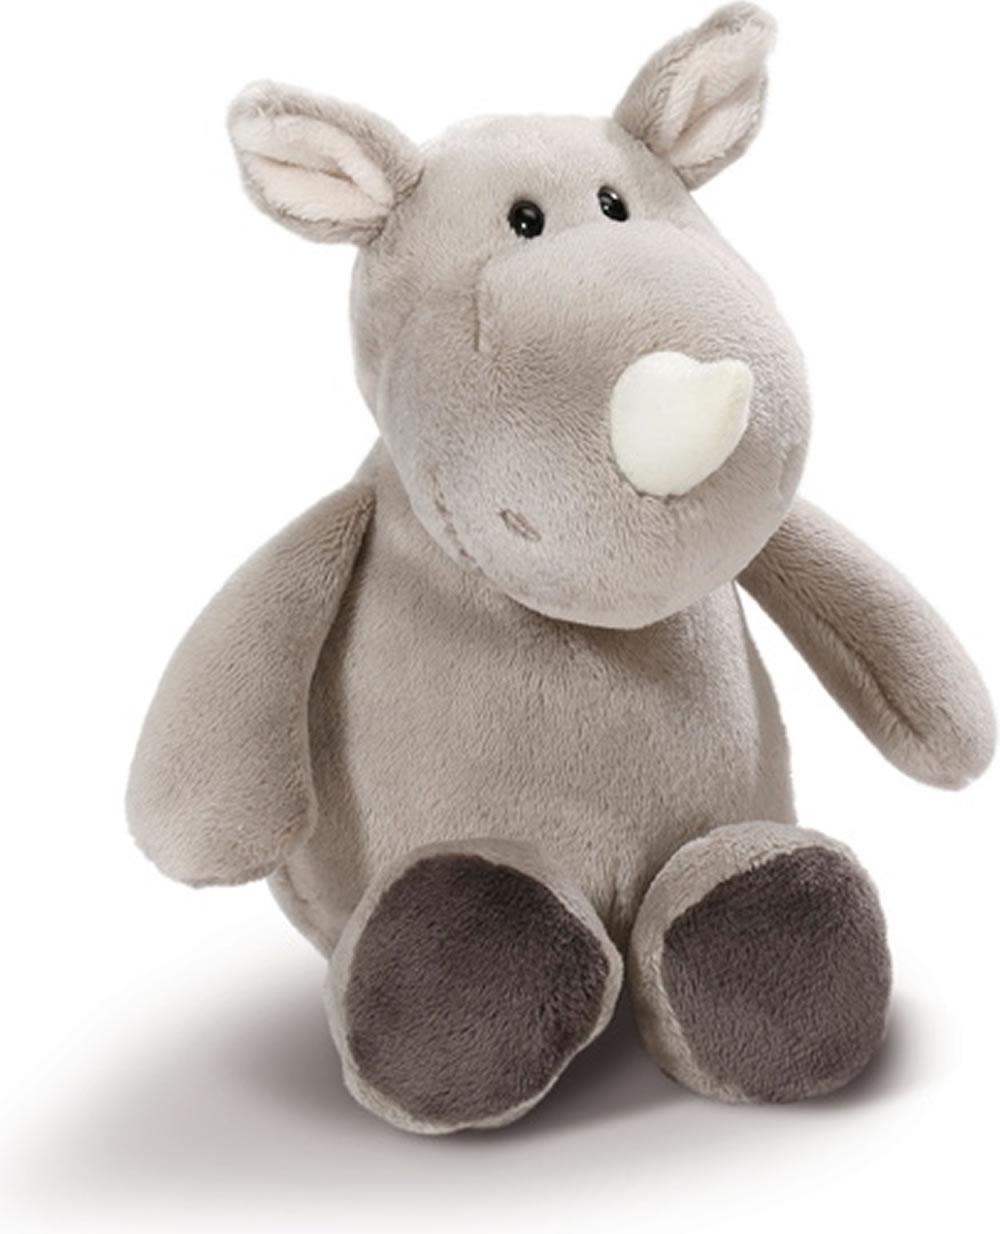 Plišana igračka ZOO FRIENDS Rhino